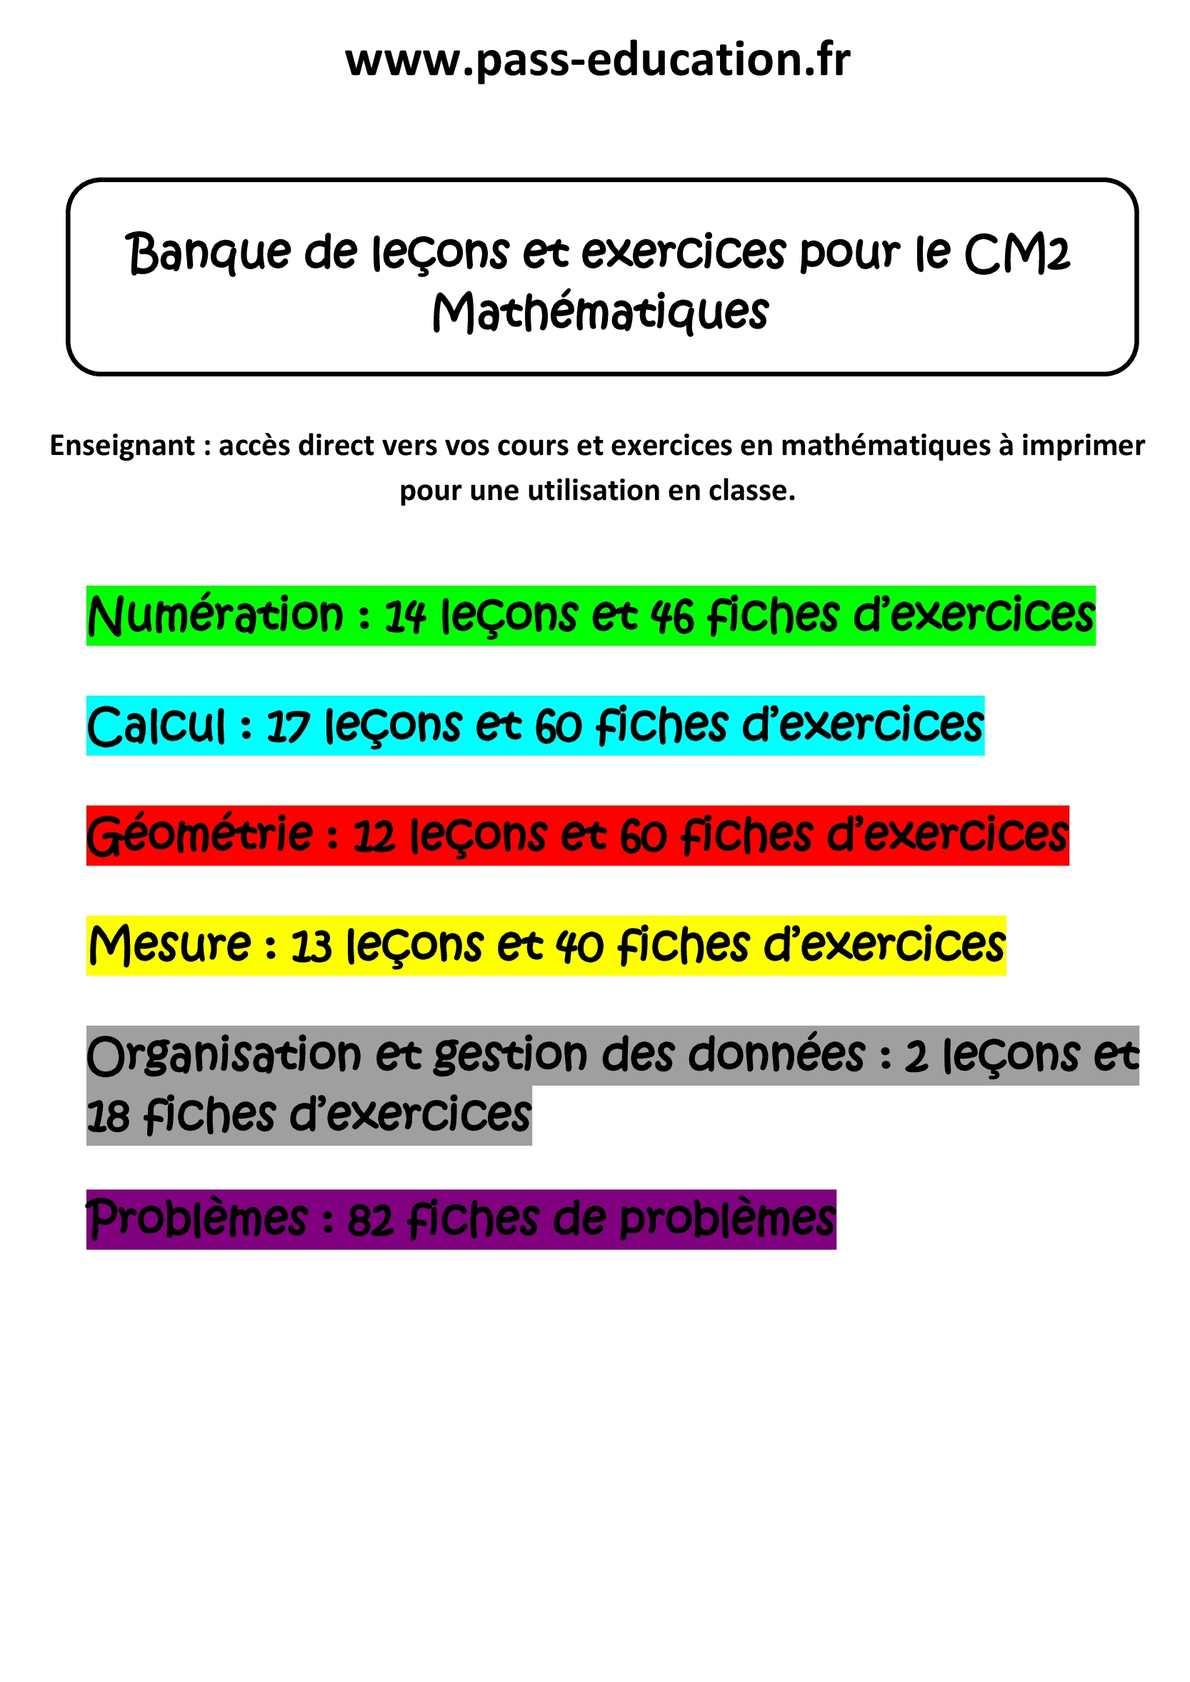 Calam o cm2 math matiques banque de le ons et exercices - Exercice de multiplication cm2 a imprimer ...